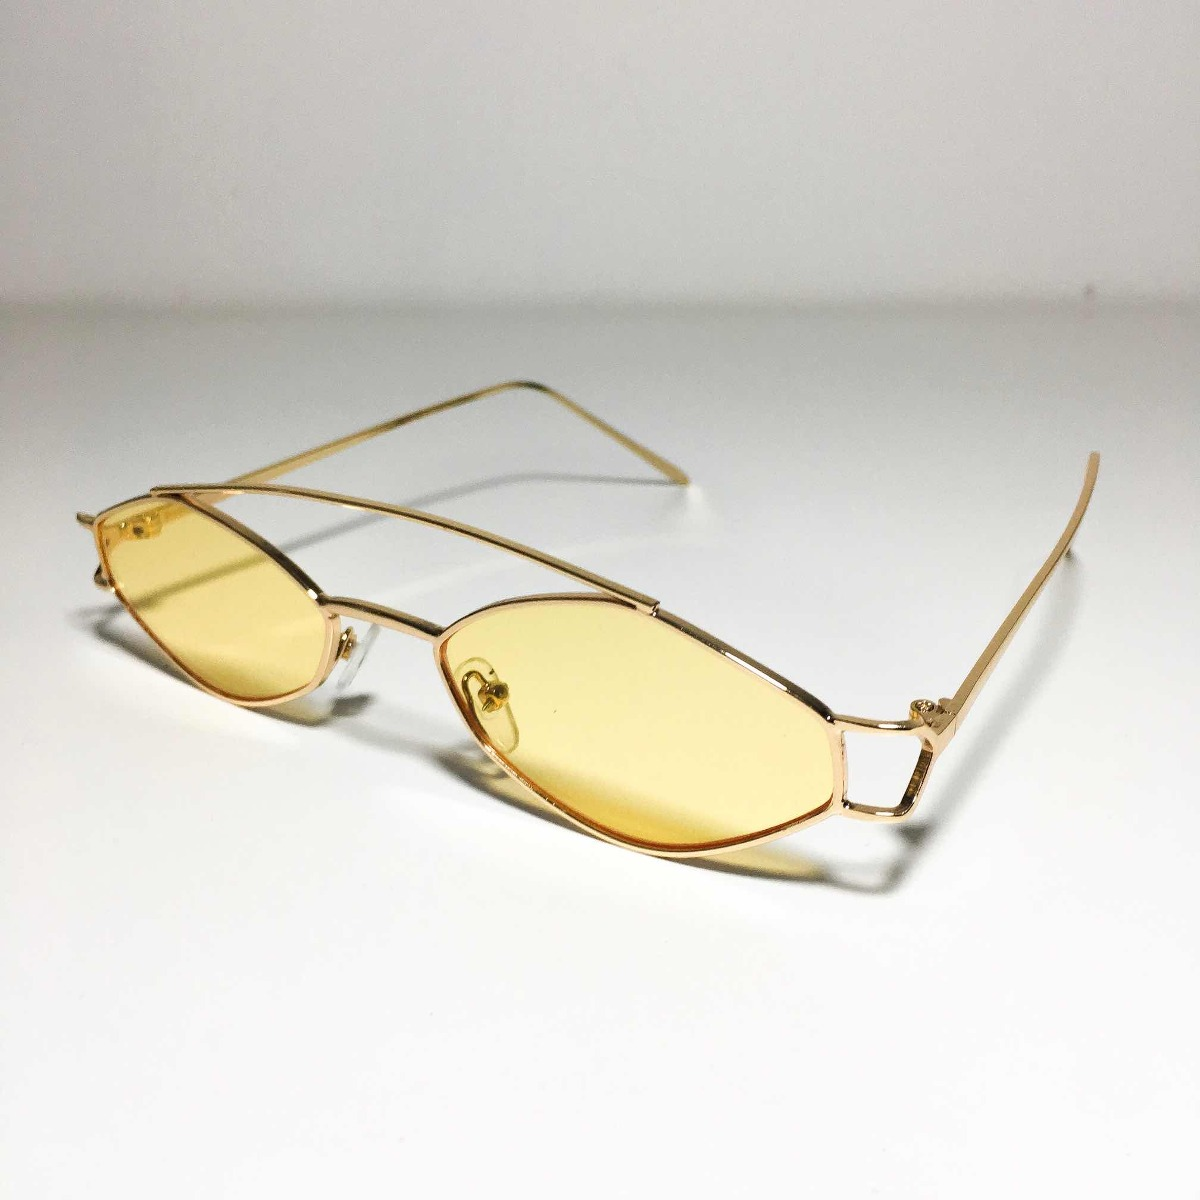 f93730f1542d9 óculos oval de sol pequeno retro vintage 90s frete grátis! Carregando zoom.